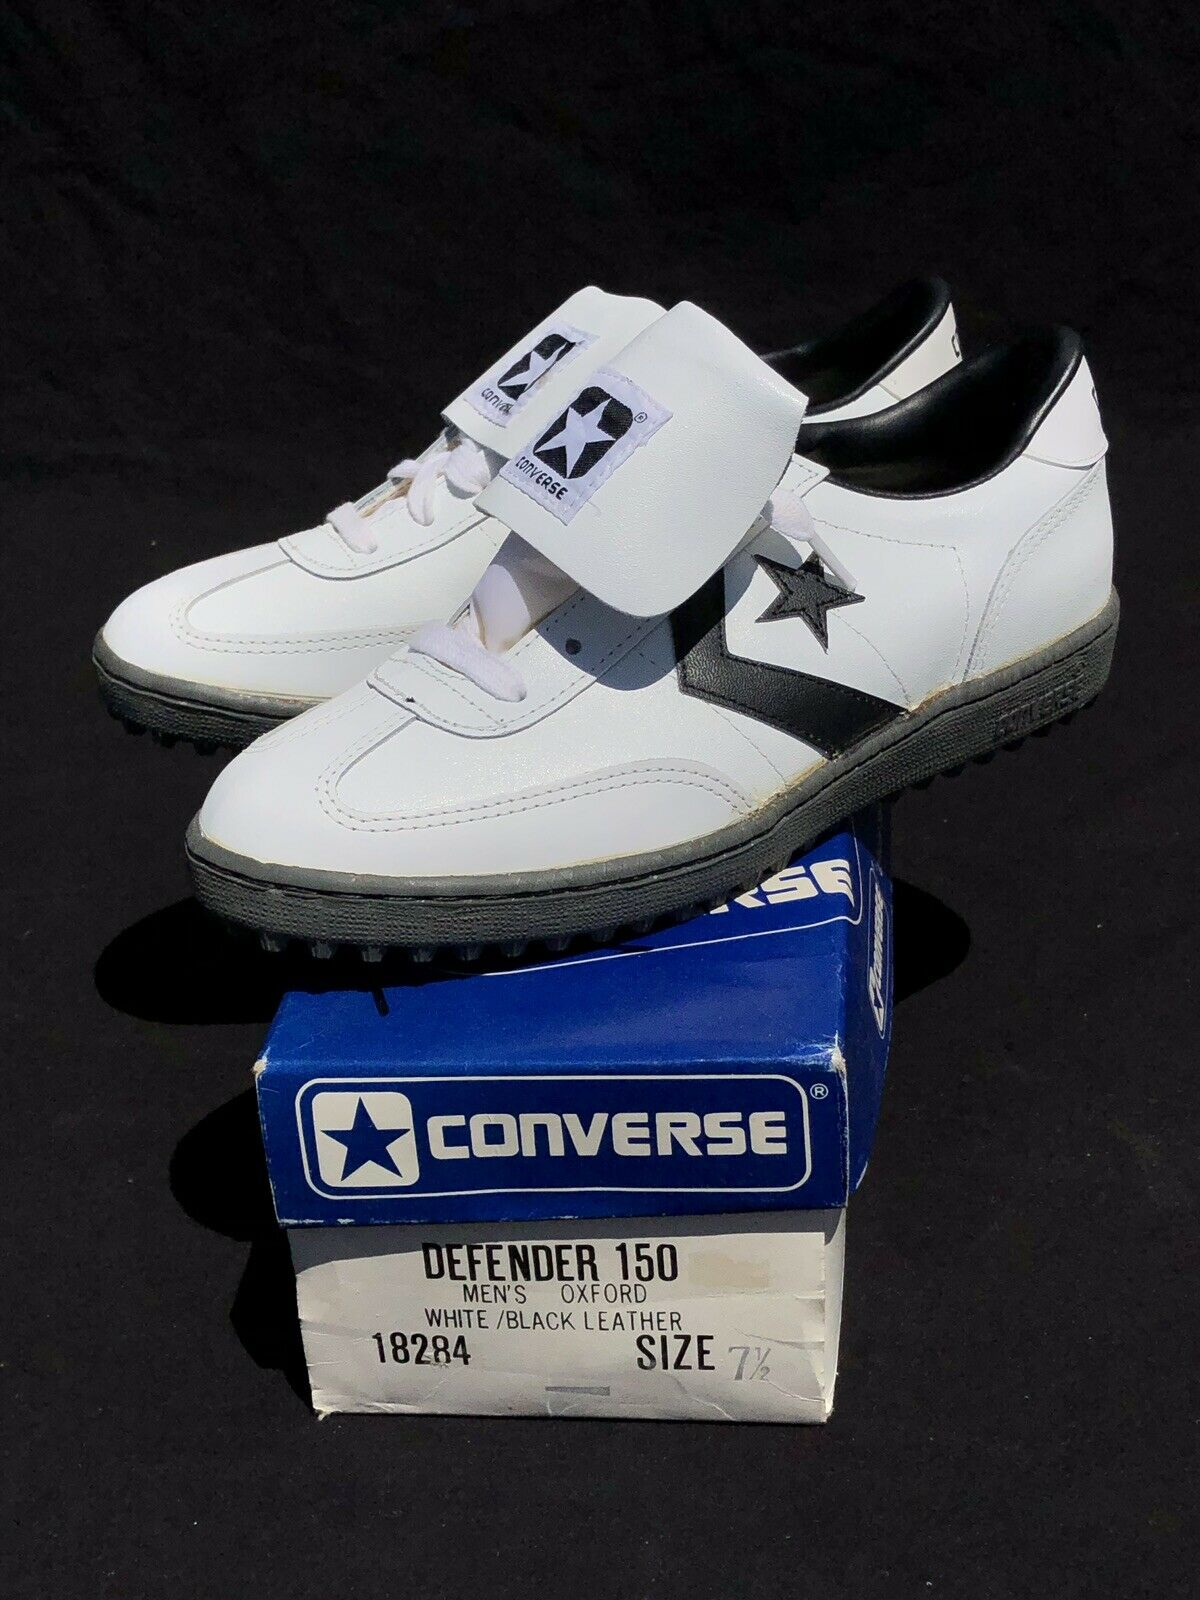 Vintage Converse Defender 150 Cleats